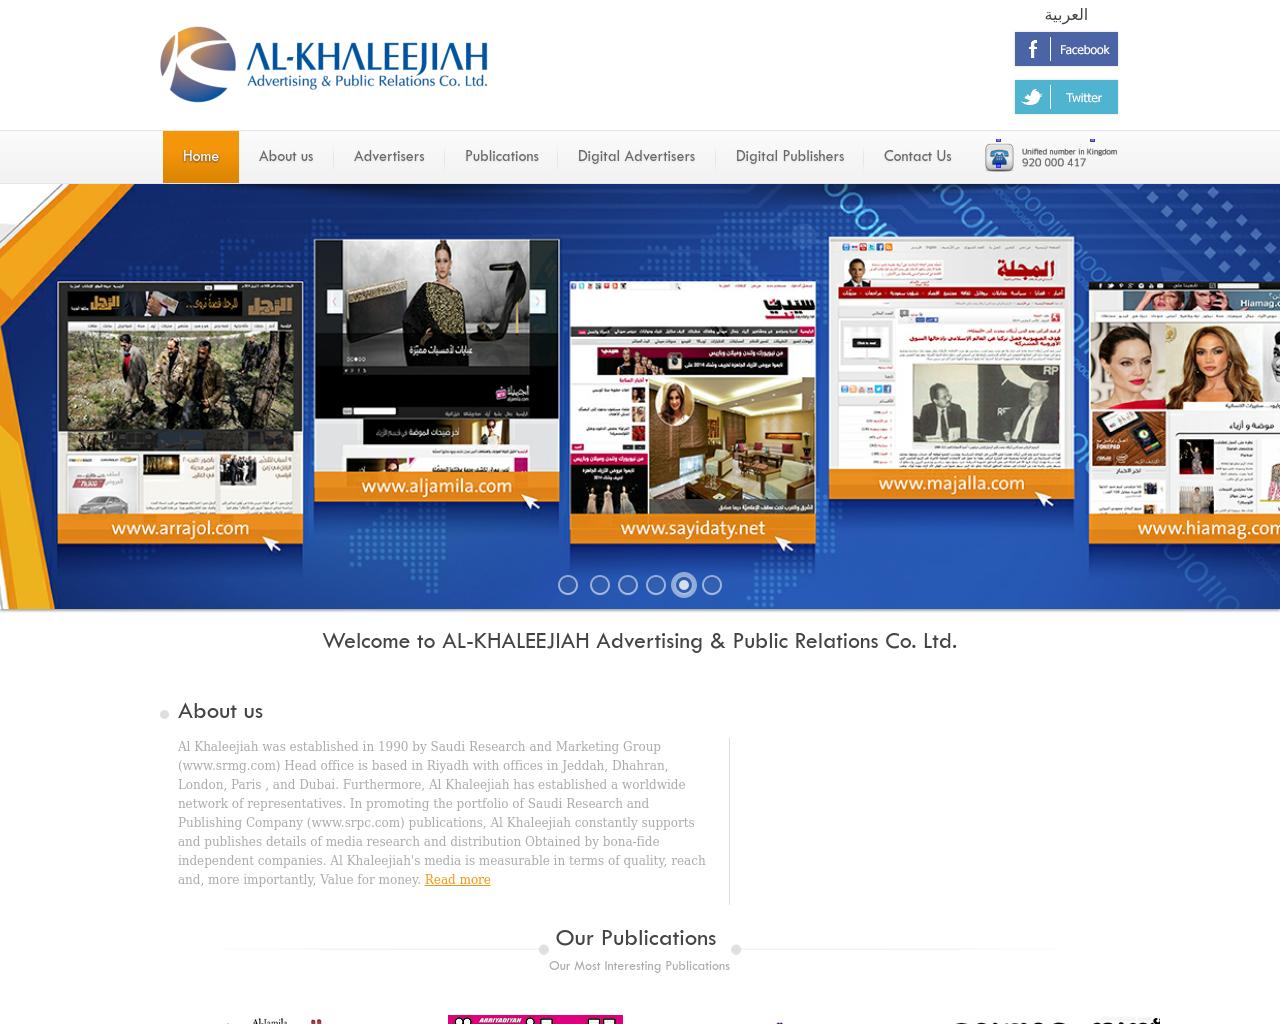 AL-KHALEEJIAH-Advertising-Advertising-Reviews-Pricing